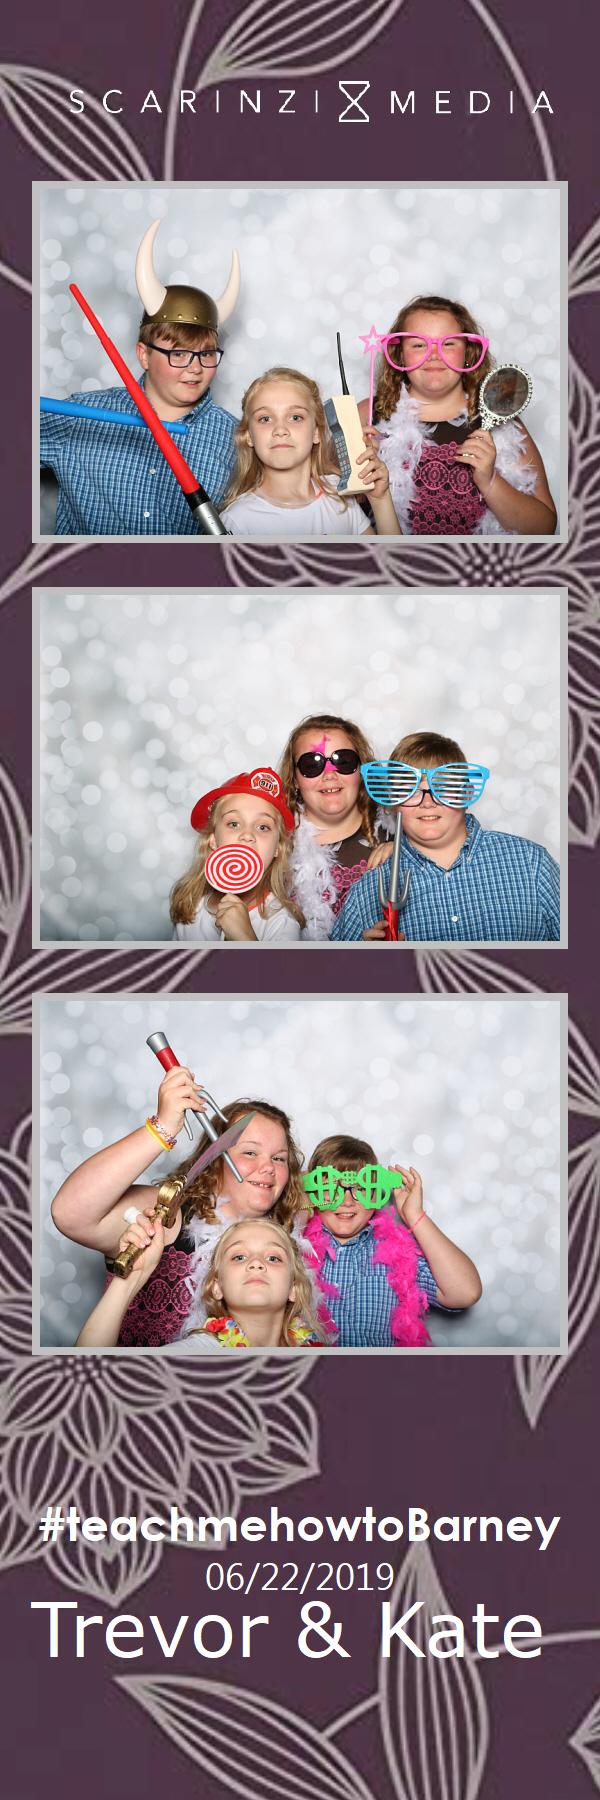 2019.06.22 - Barney Wedding PHOTOBOOTH84.jpg